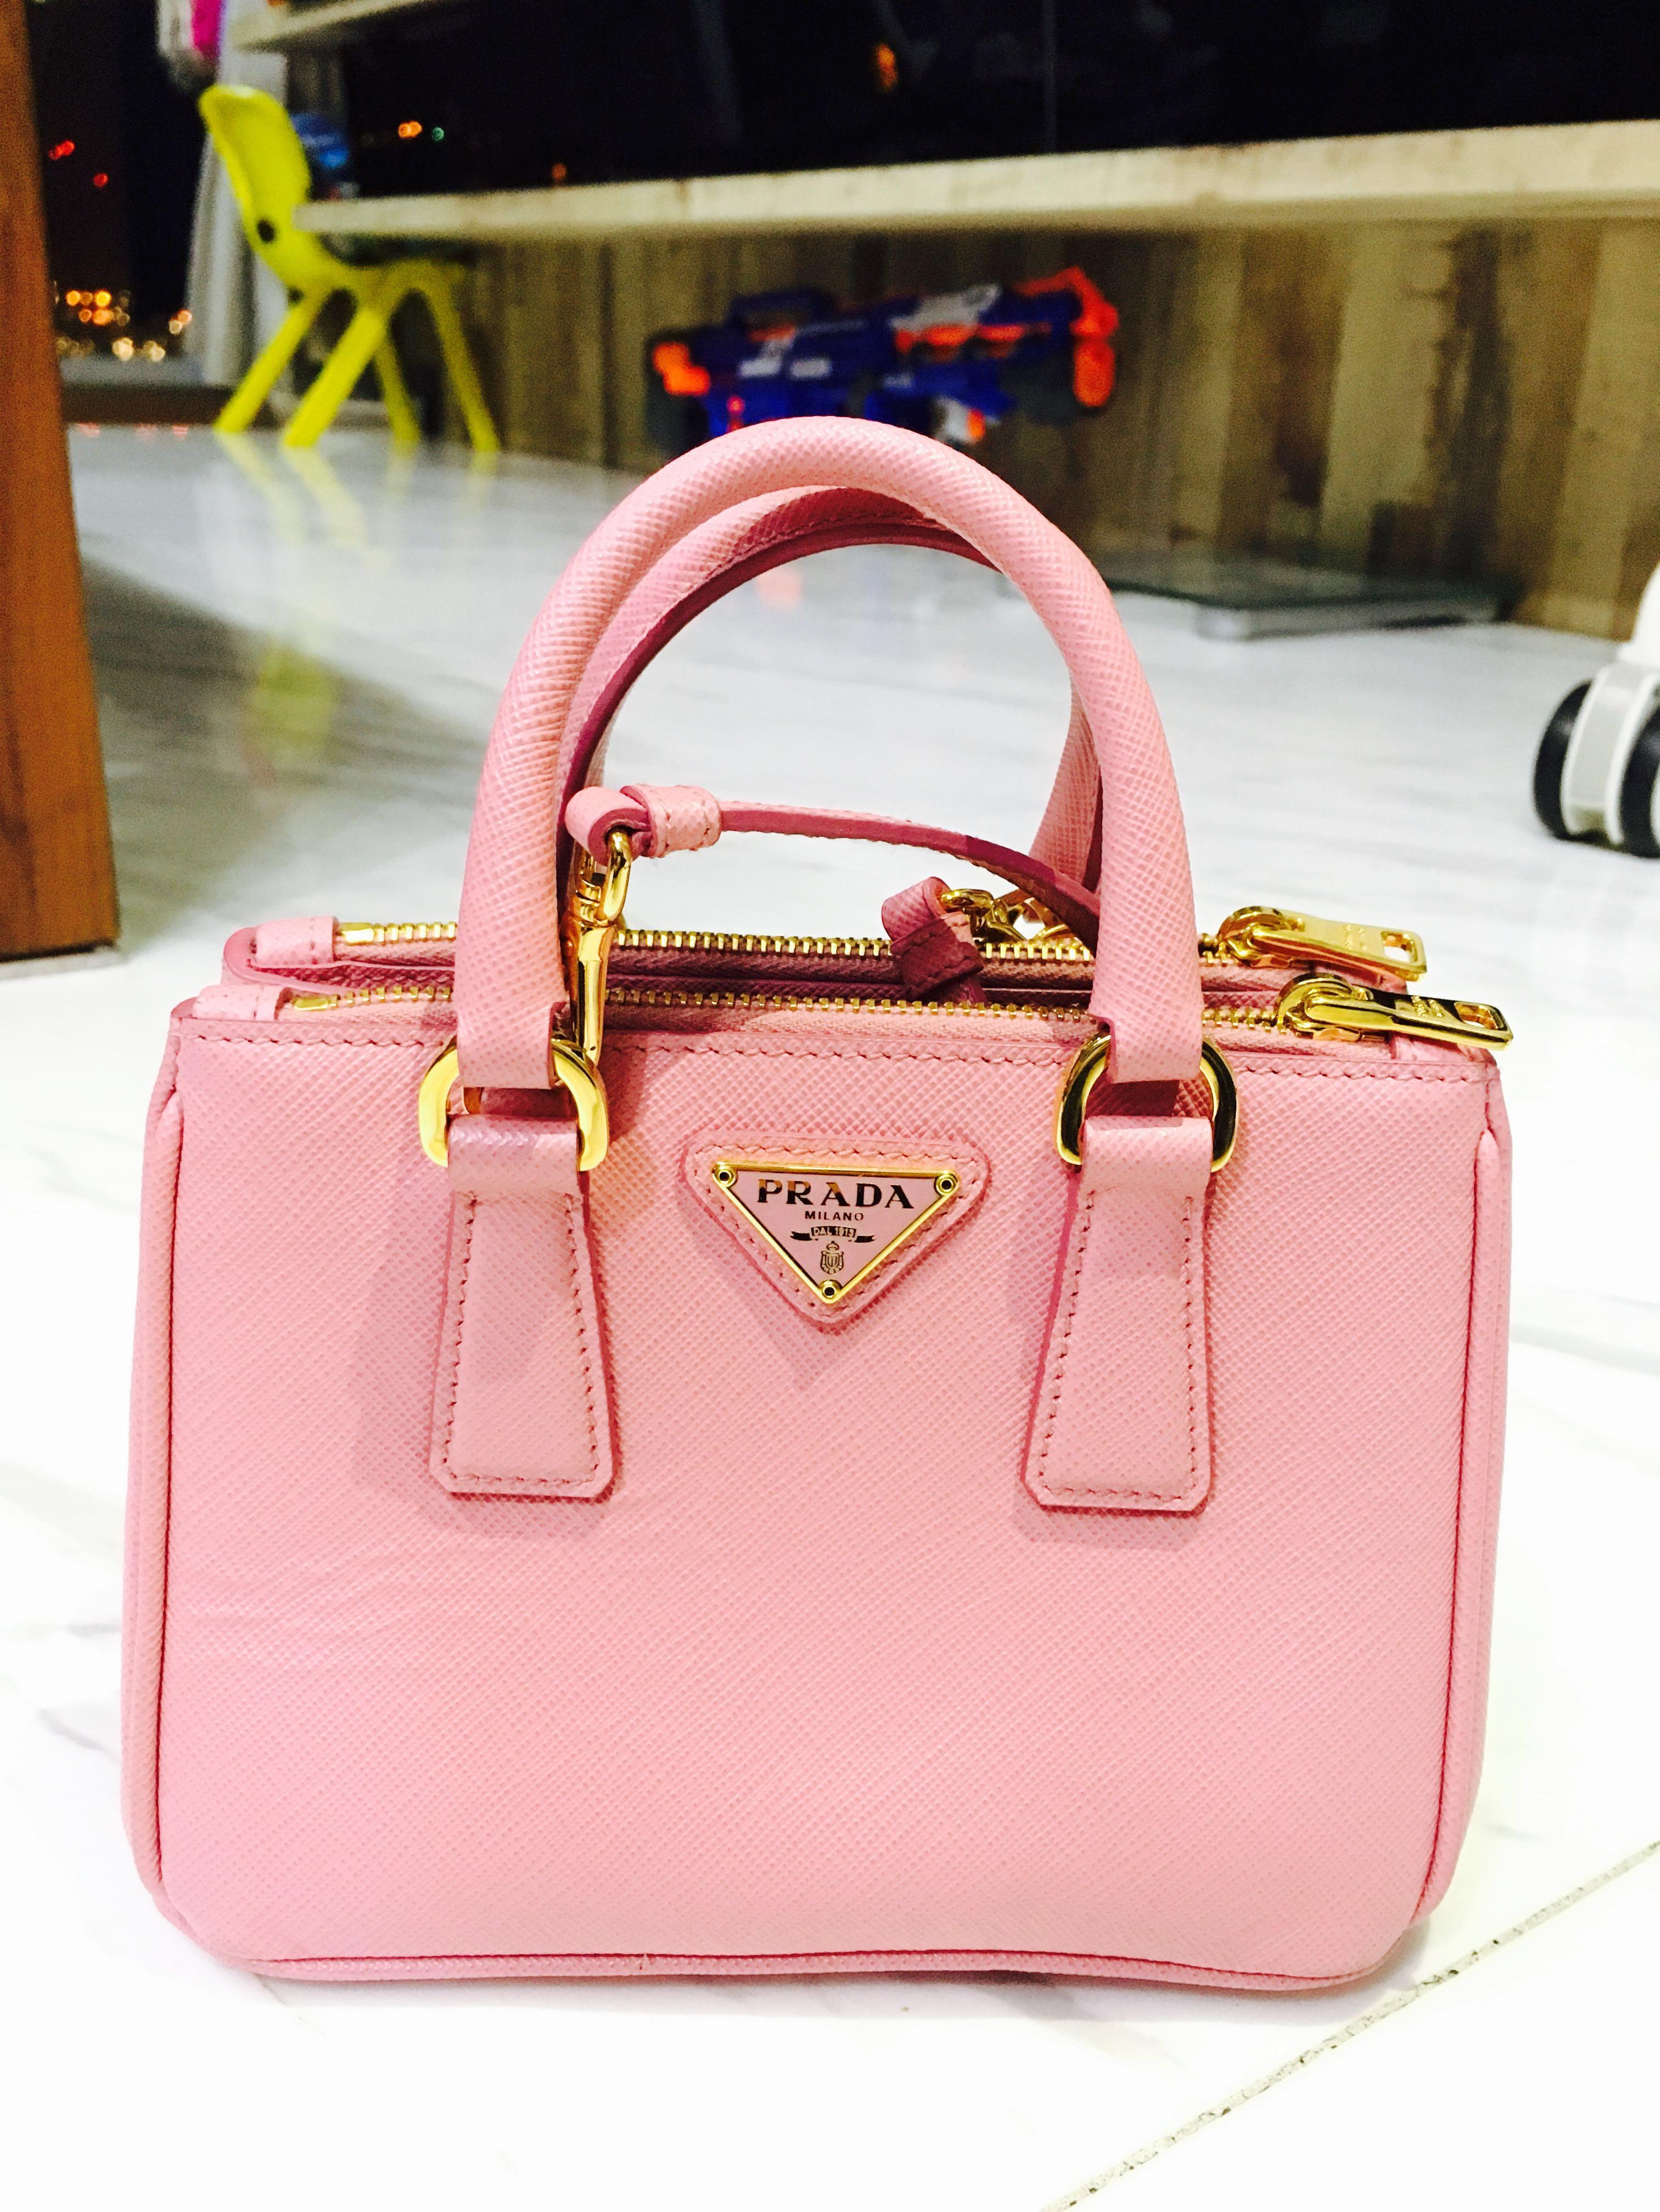 14af6fb378dc Prada Saffiano Bag, Women's Fashion, Bags & Wallets, Handbags on ...